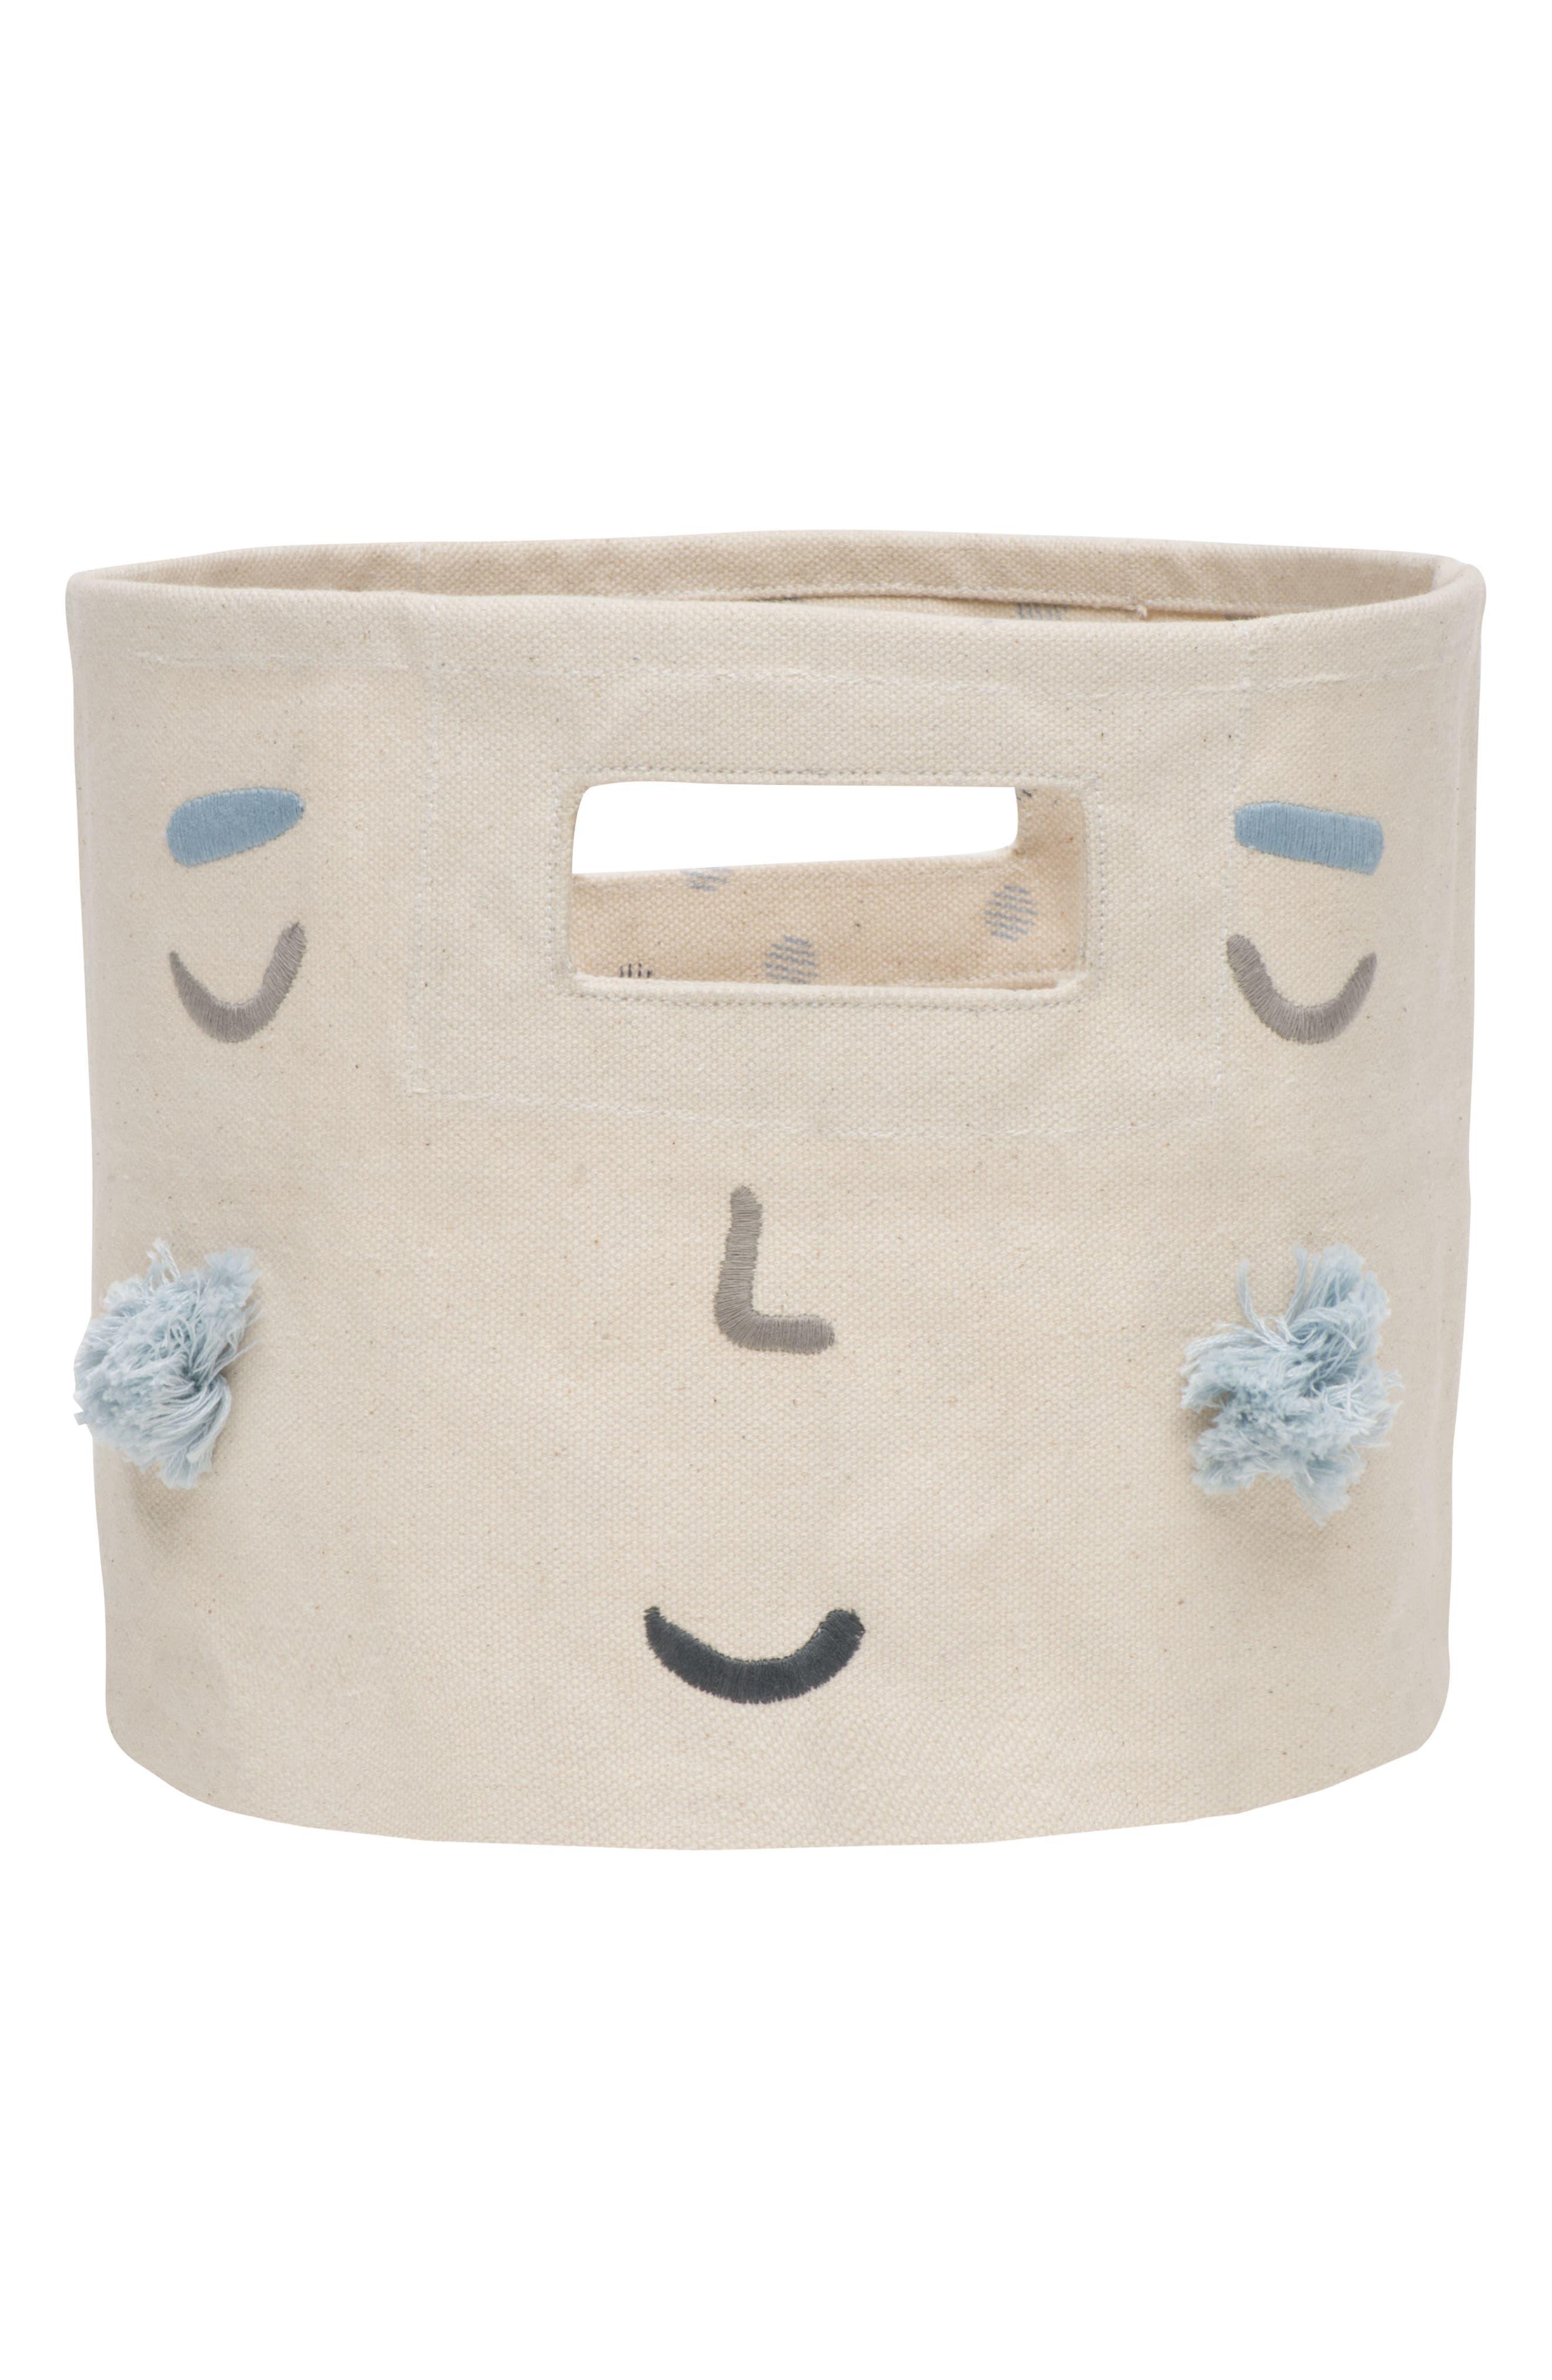 Peek-A-Boo Boy Mini Canvas Bin,                             Alternate thumbnail 2, color,                             Ivory